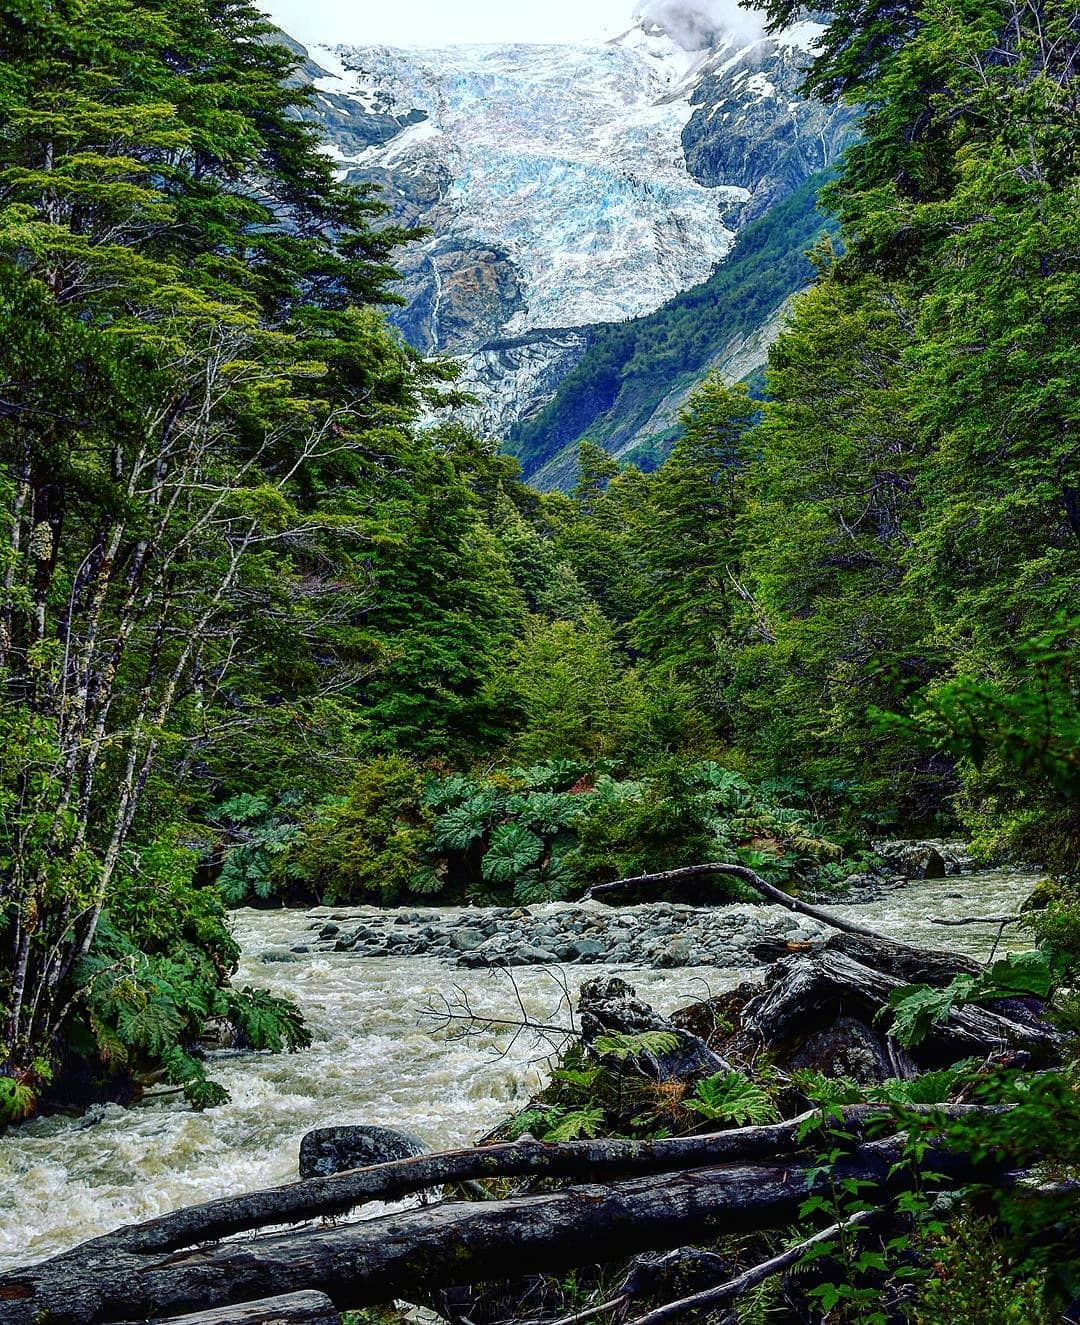 Ventisquero Yelcho Trail at Corcovado National Park